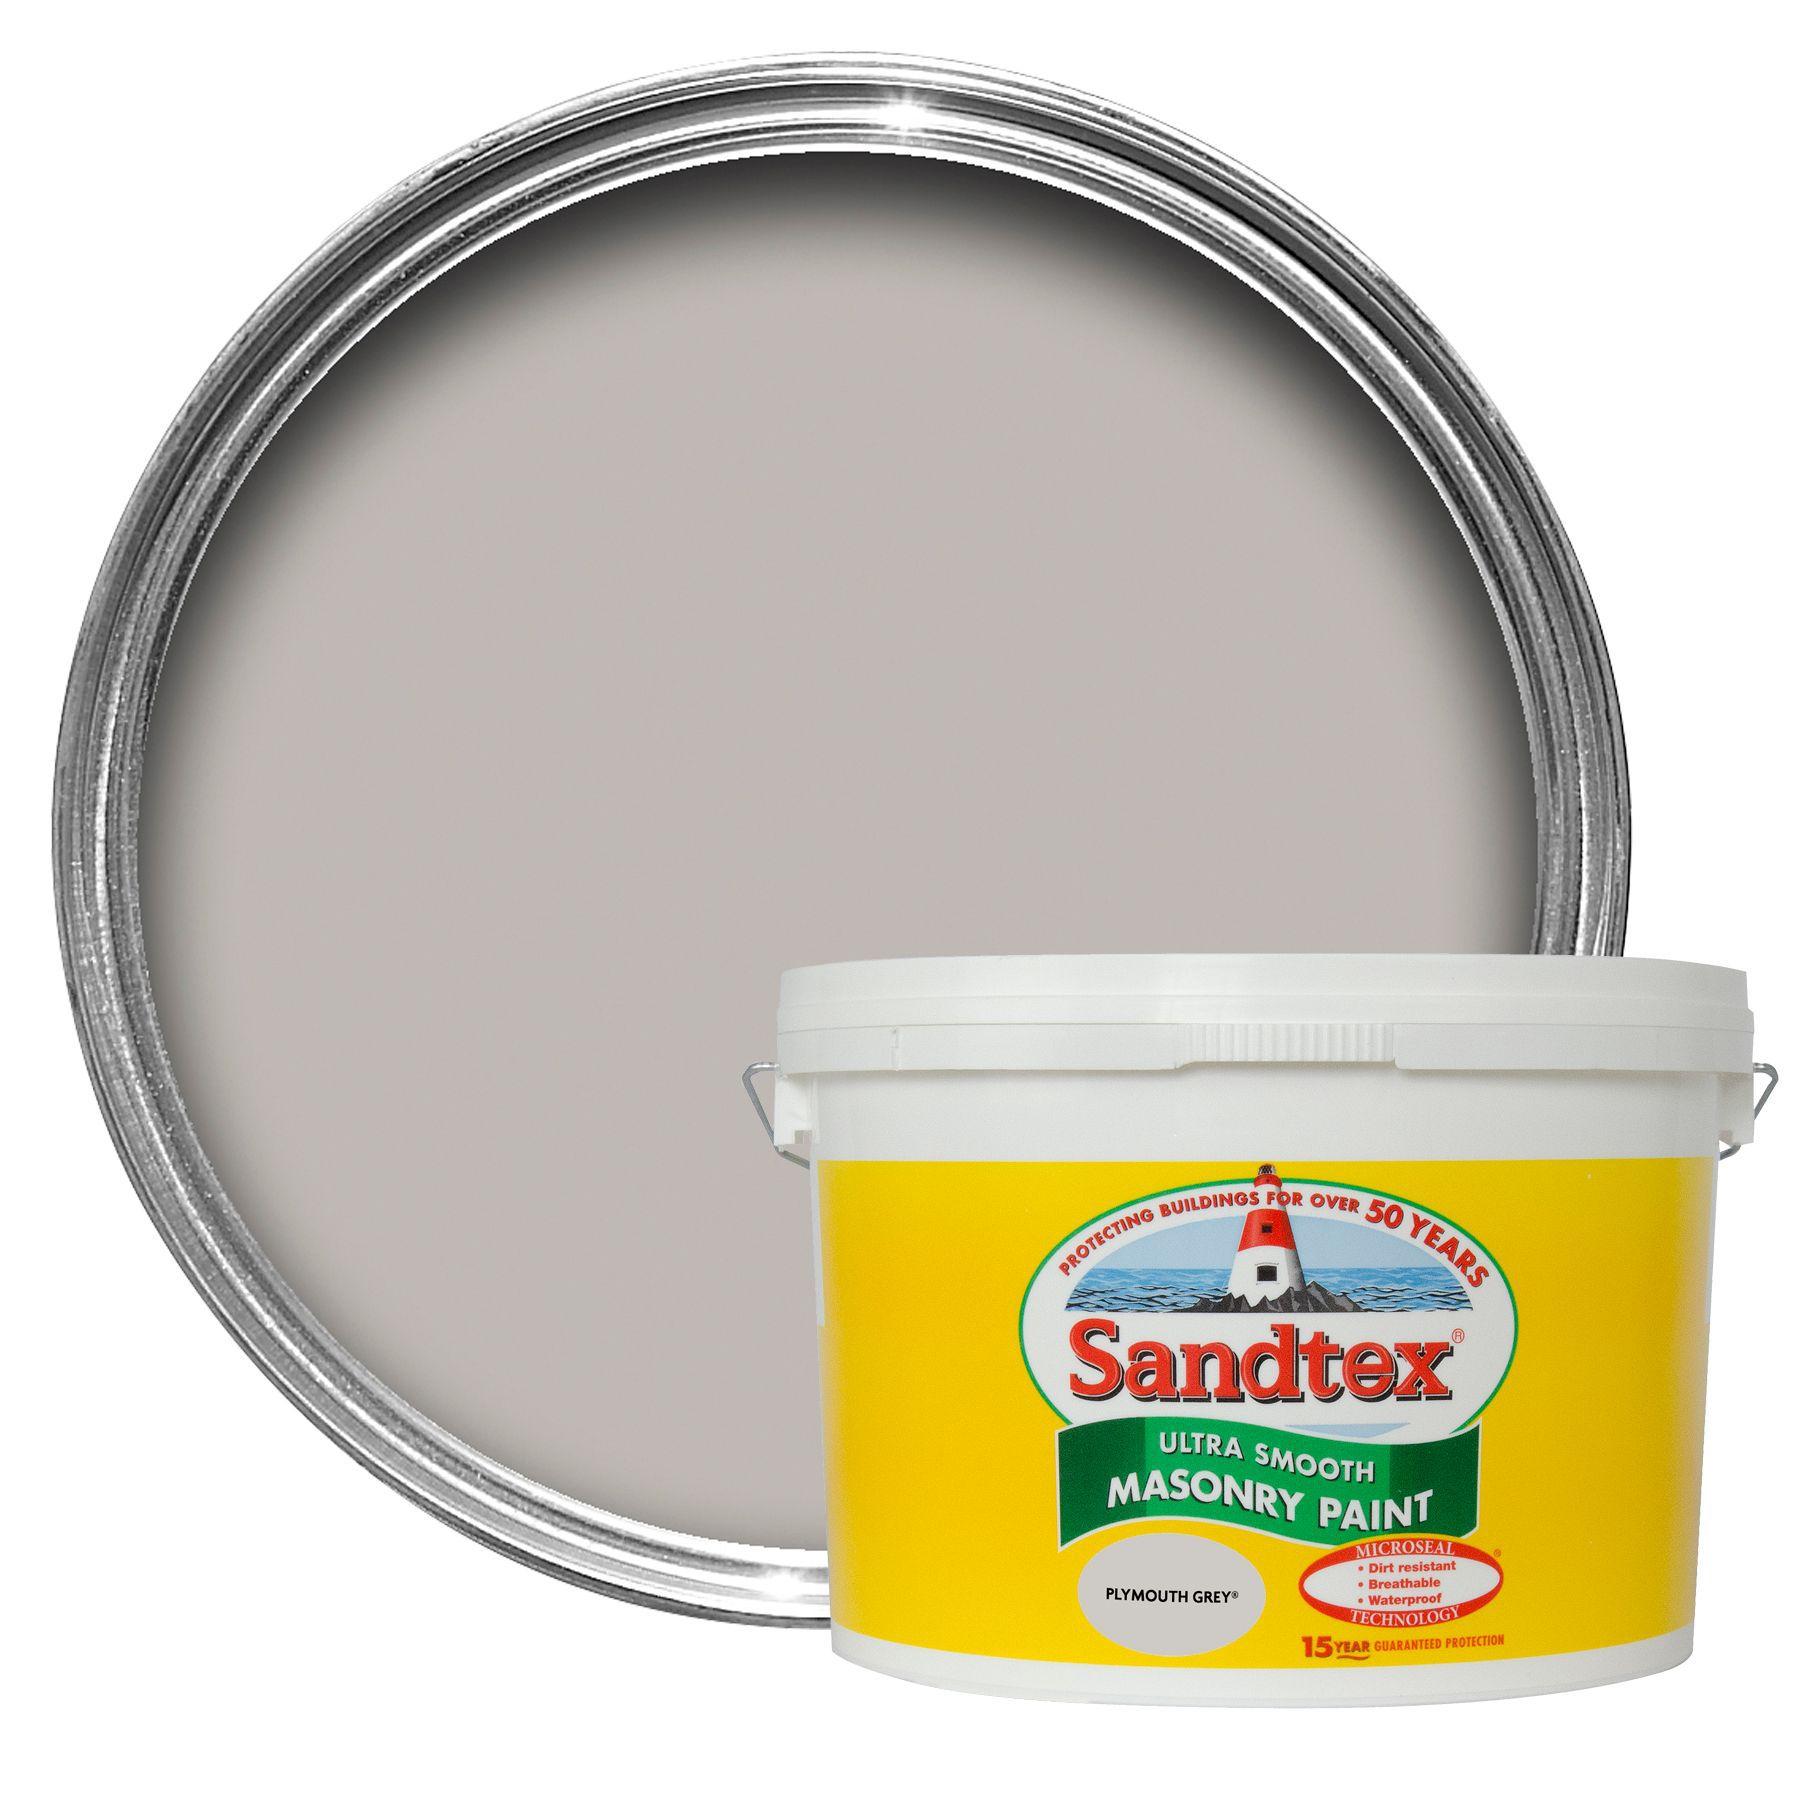 sandtex plymouth grey smooth smooth matt masonry paint 10l. Black Bedroom Furniture Sets. Home Design Ideas